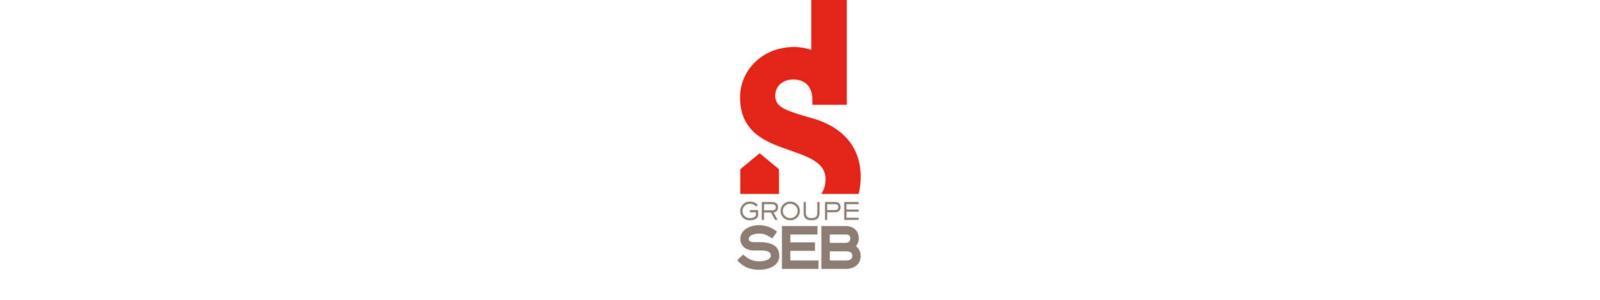 SEB - Case Study